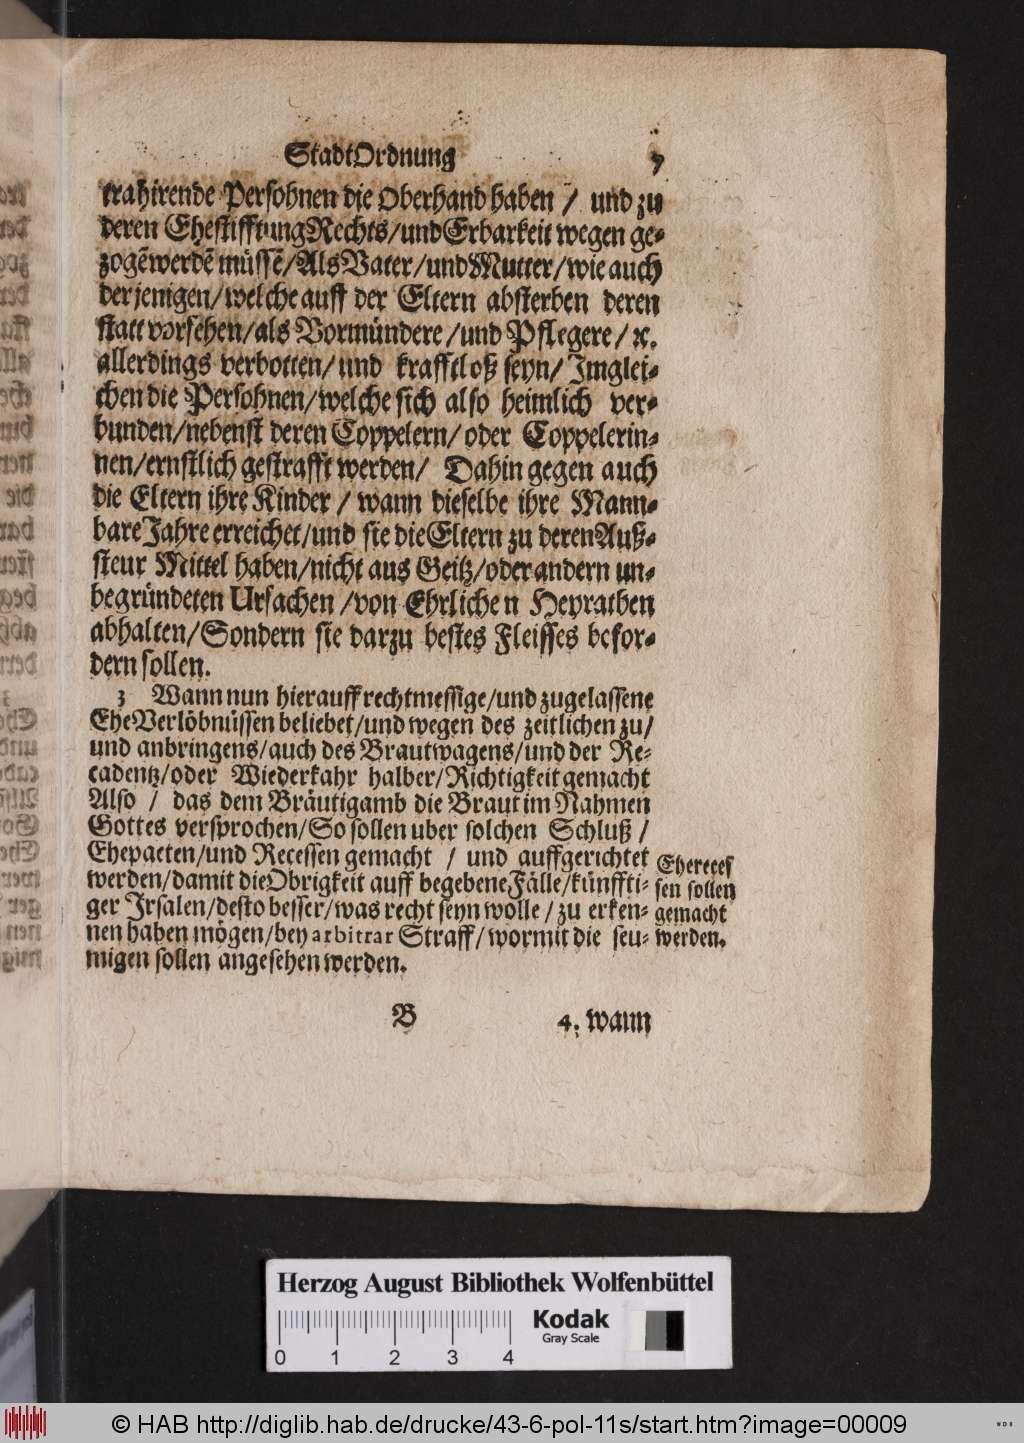 http://diglib.hab.de/drucke/43-6-pol-11s/00009.jpg